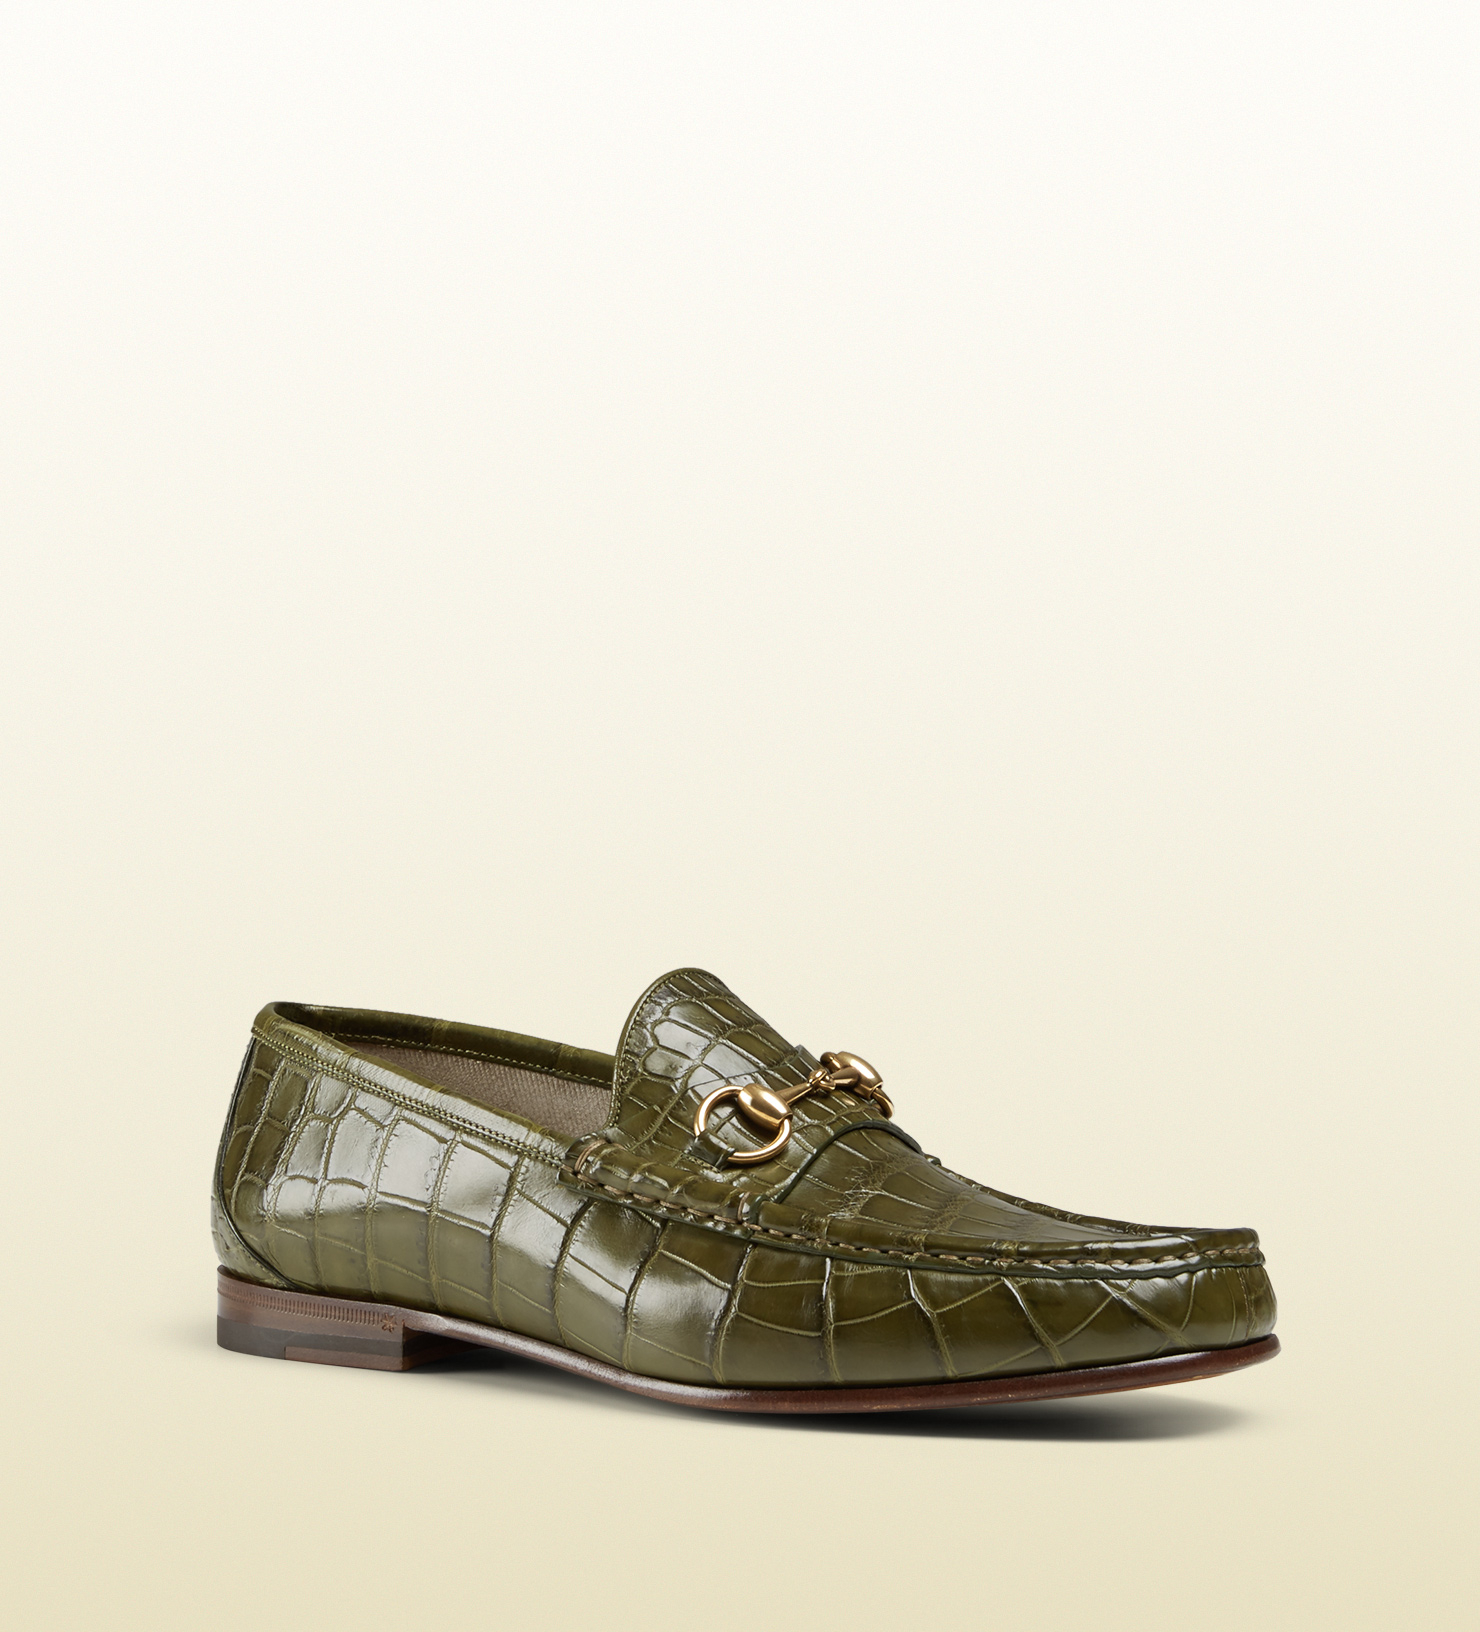 3ab49f084 Gucci Men's Crocodile 1953 Horsebit Loafer in Green for Men - Lyst